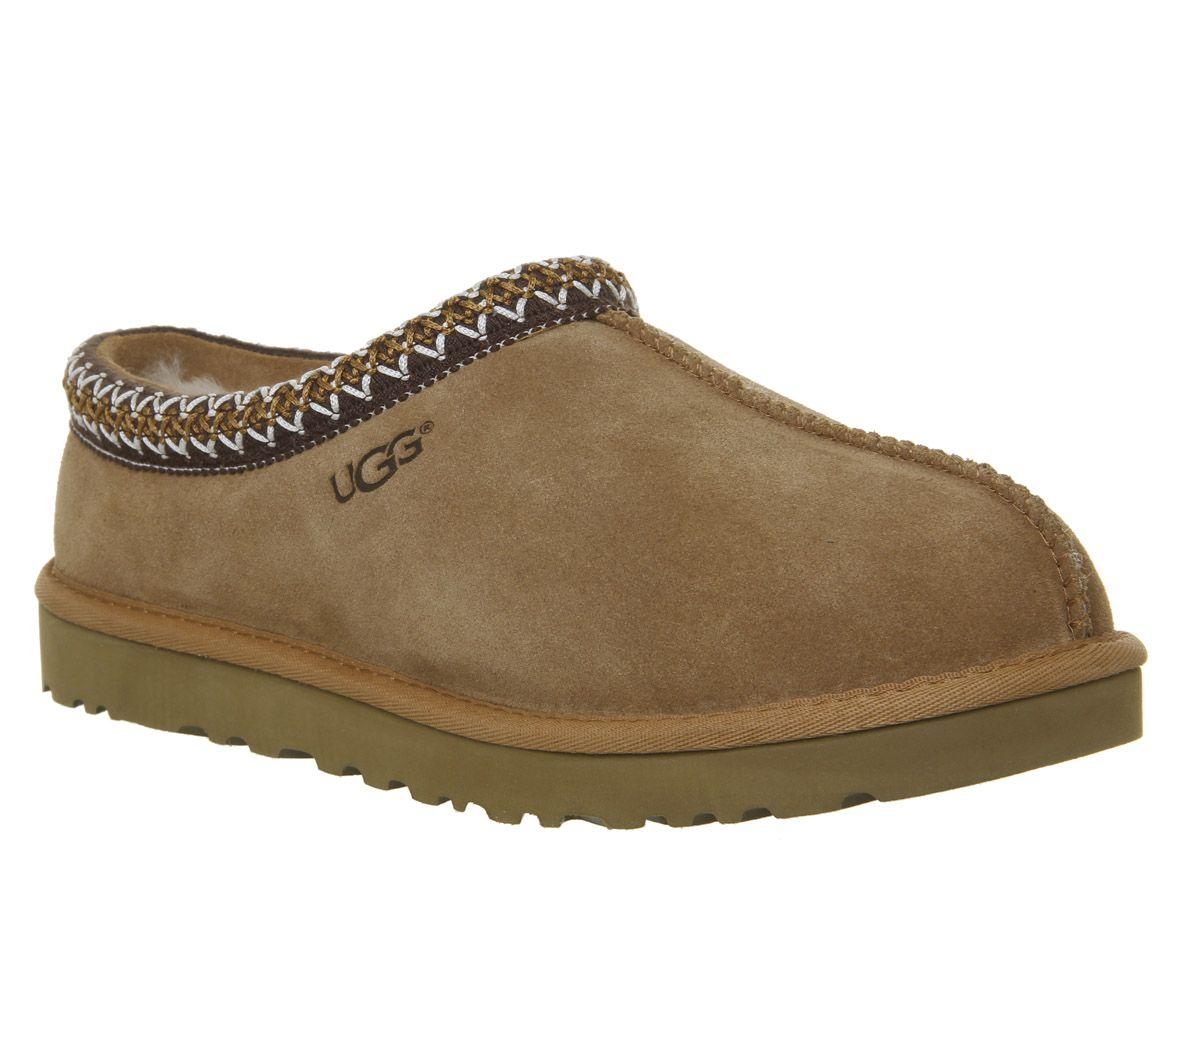 62aeea515b52 UGG Tasman Slippers Chestnut Suede - Casual